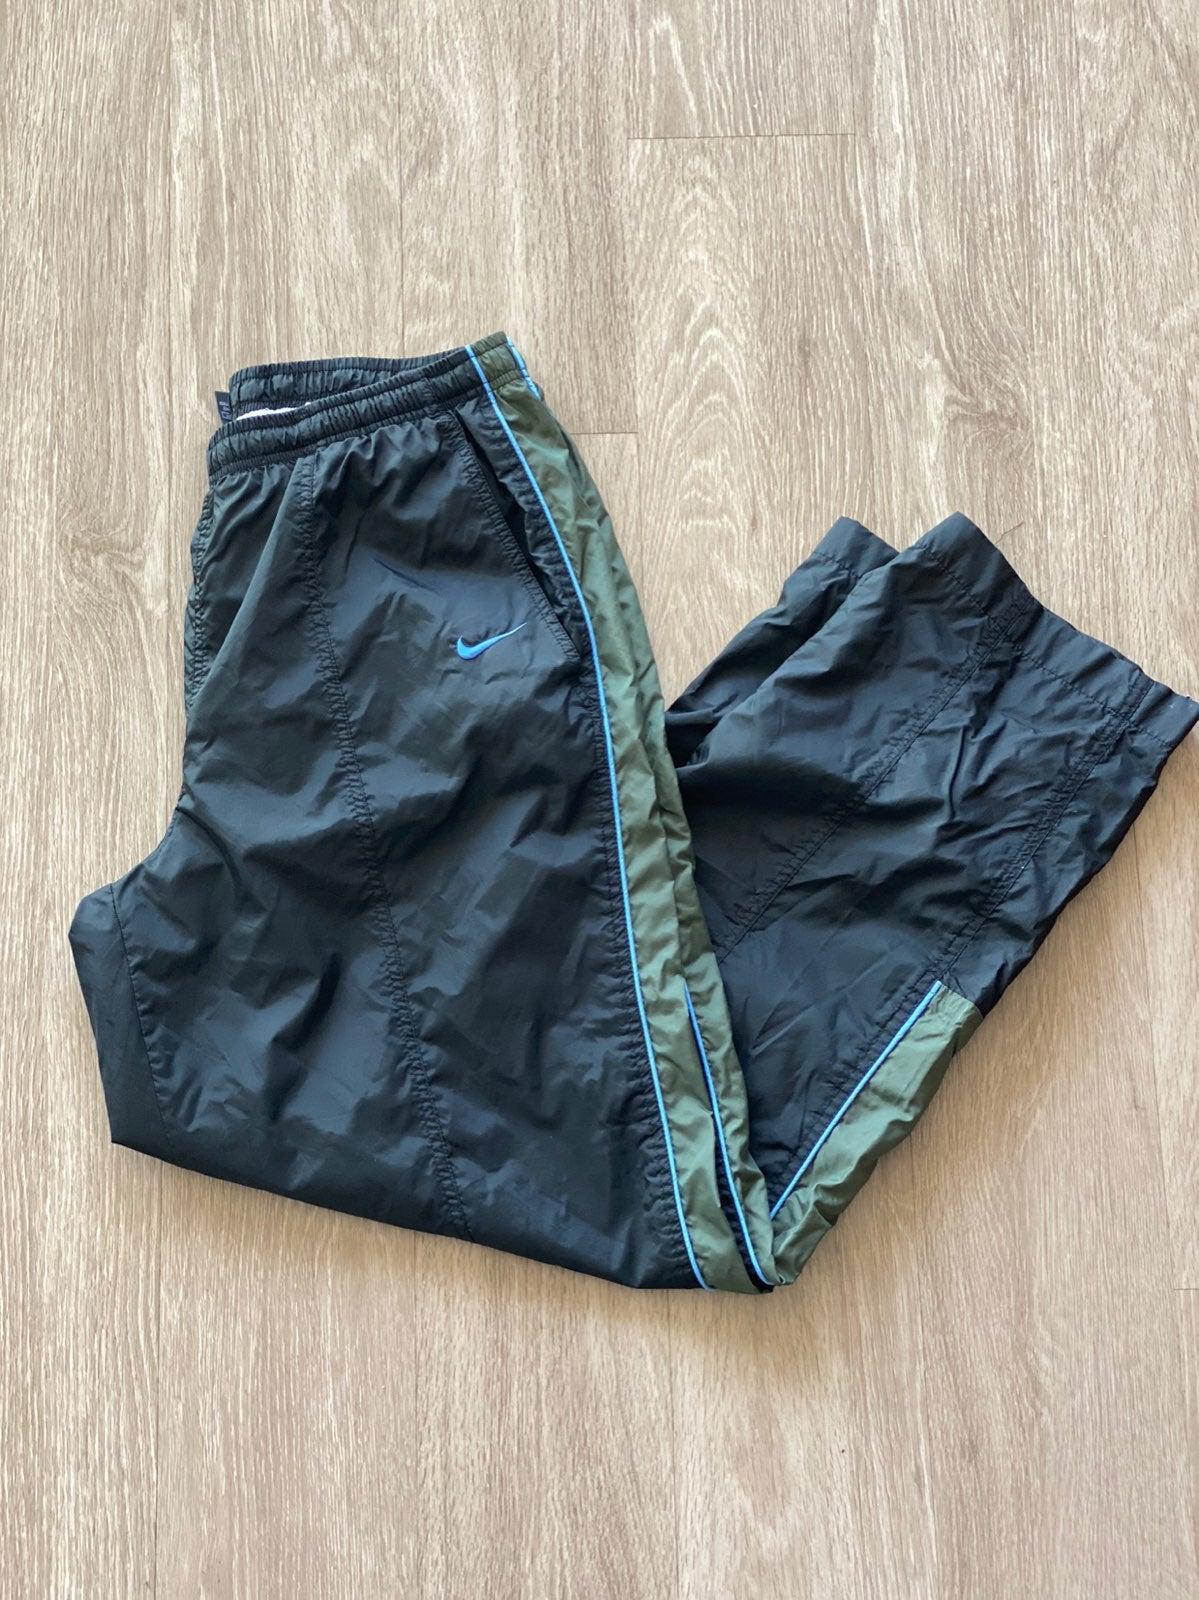 Vintage Nike Track Pants Sz L